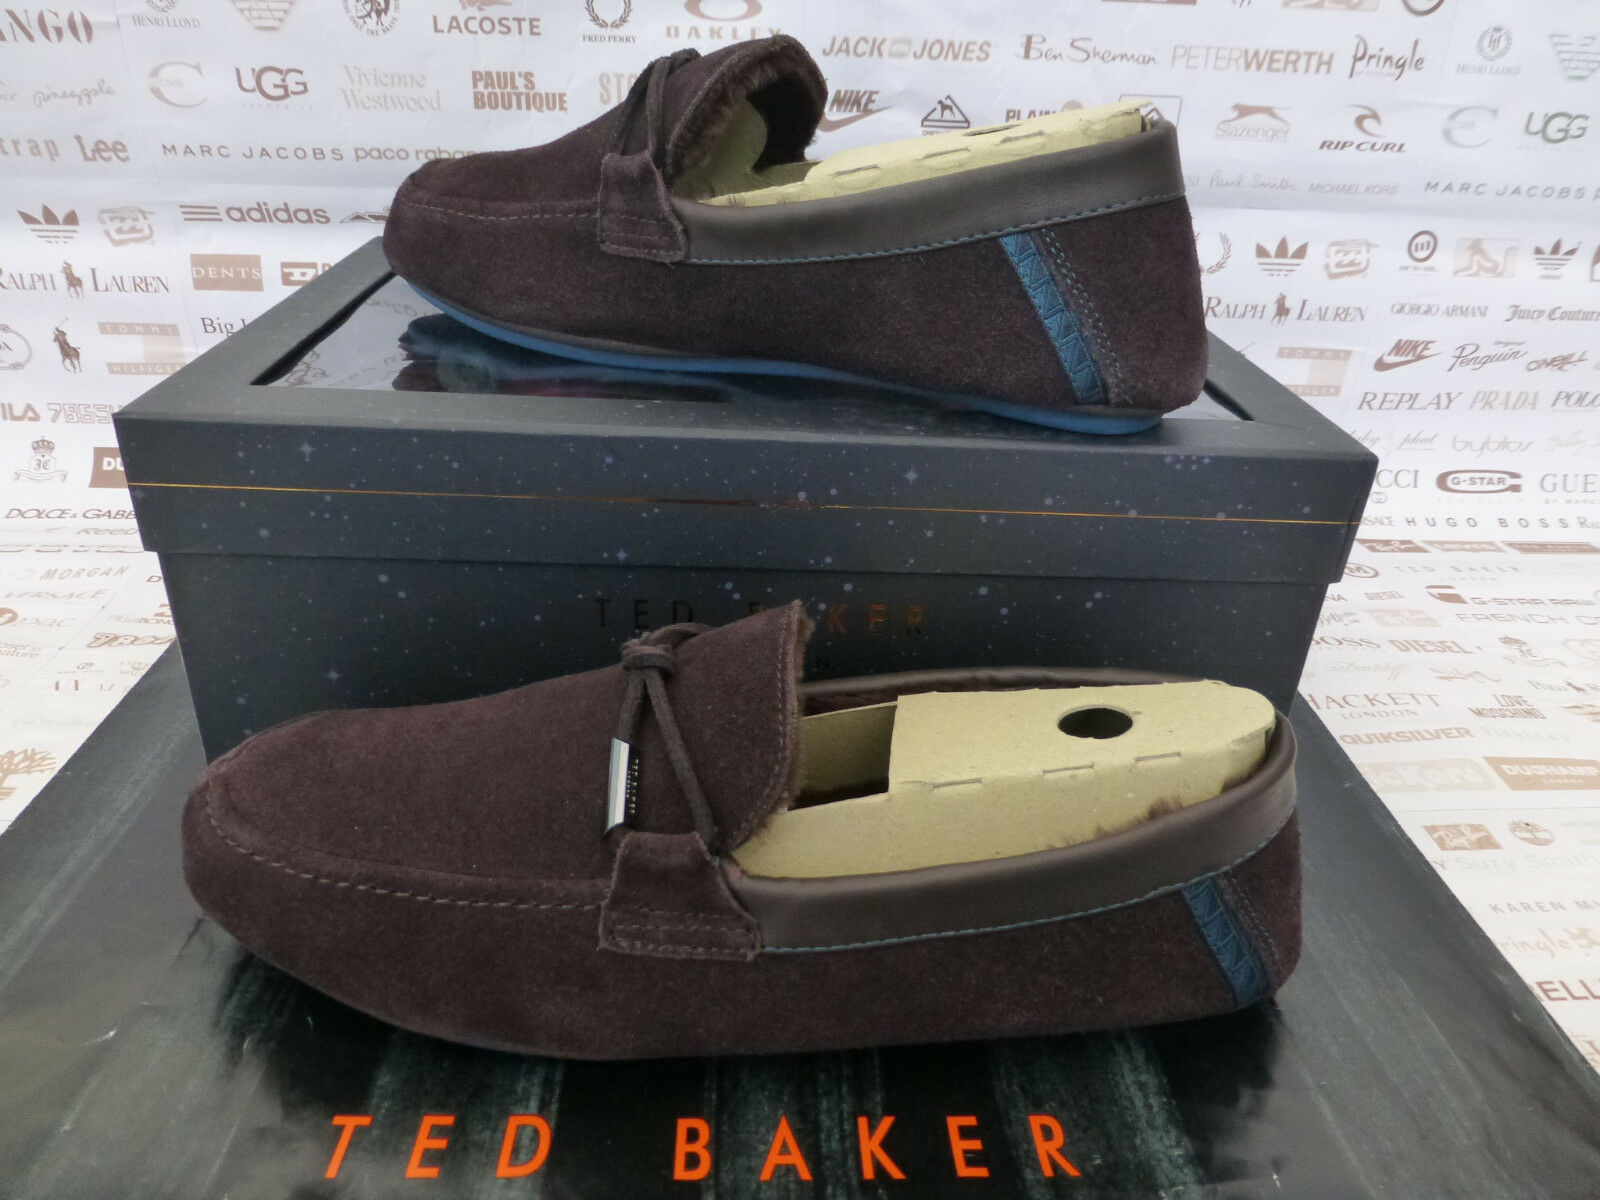 TED BAKER in pelle scamosciata Pantofola Da Uomo valcent accogliente Slip-On Pantofole Marrone Box RP | Affidabile Reputazione  | Sig/Sig Ra Scarpa